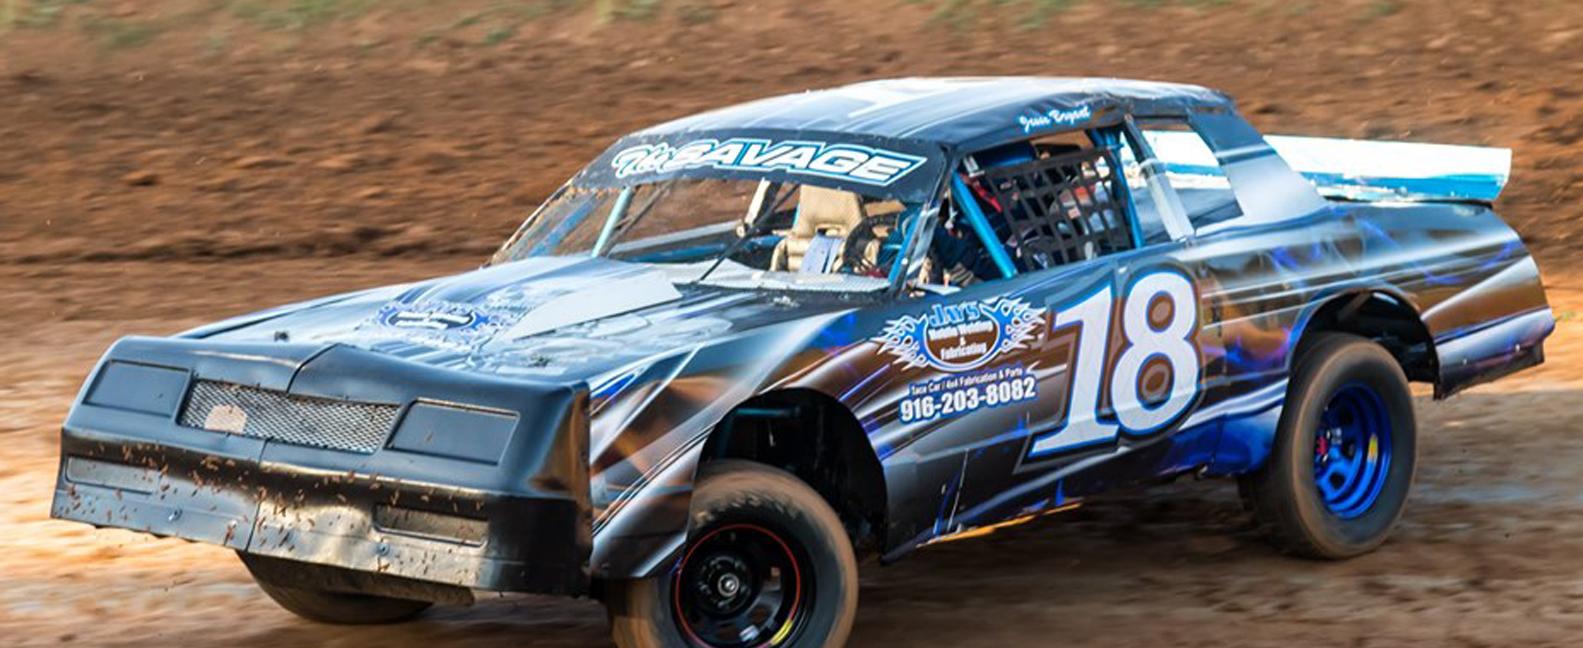 PLACERVILLE SPEEDWAY | Home | Dirt Racing - California USA